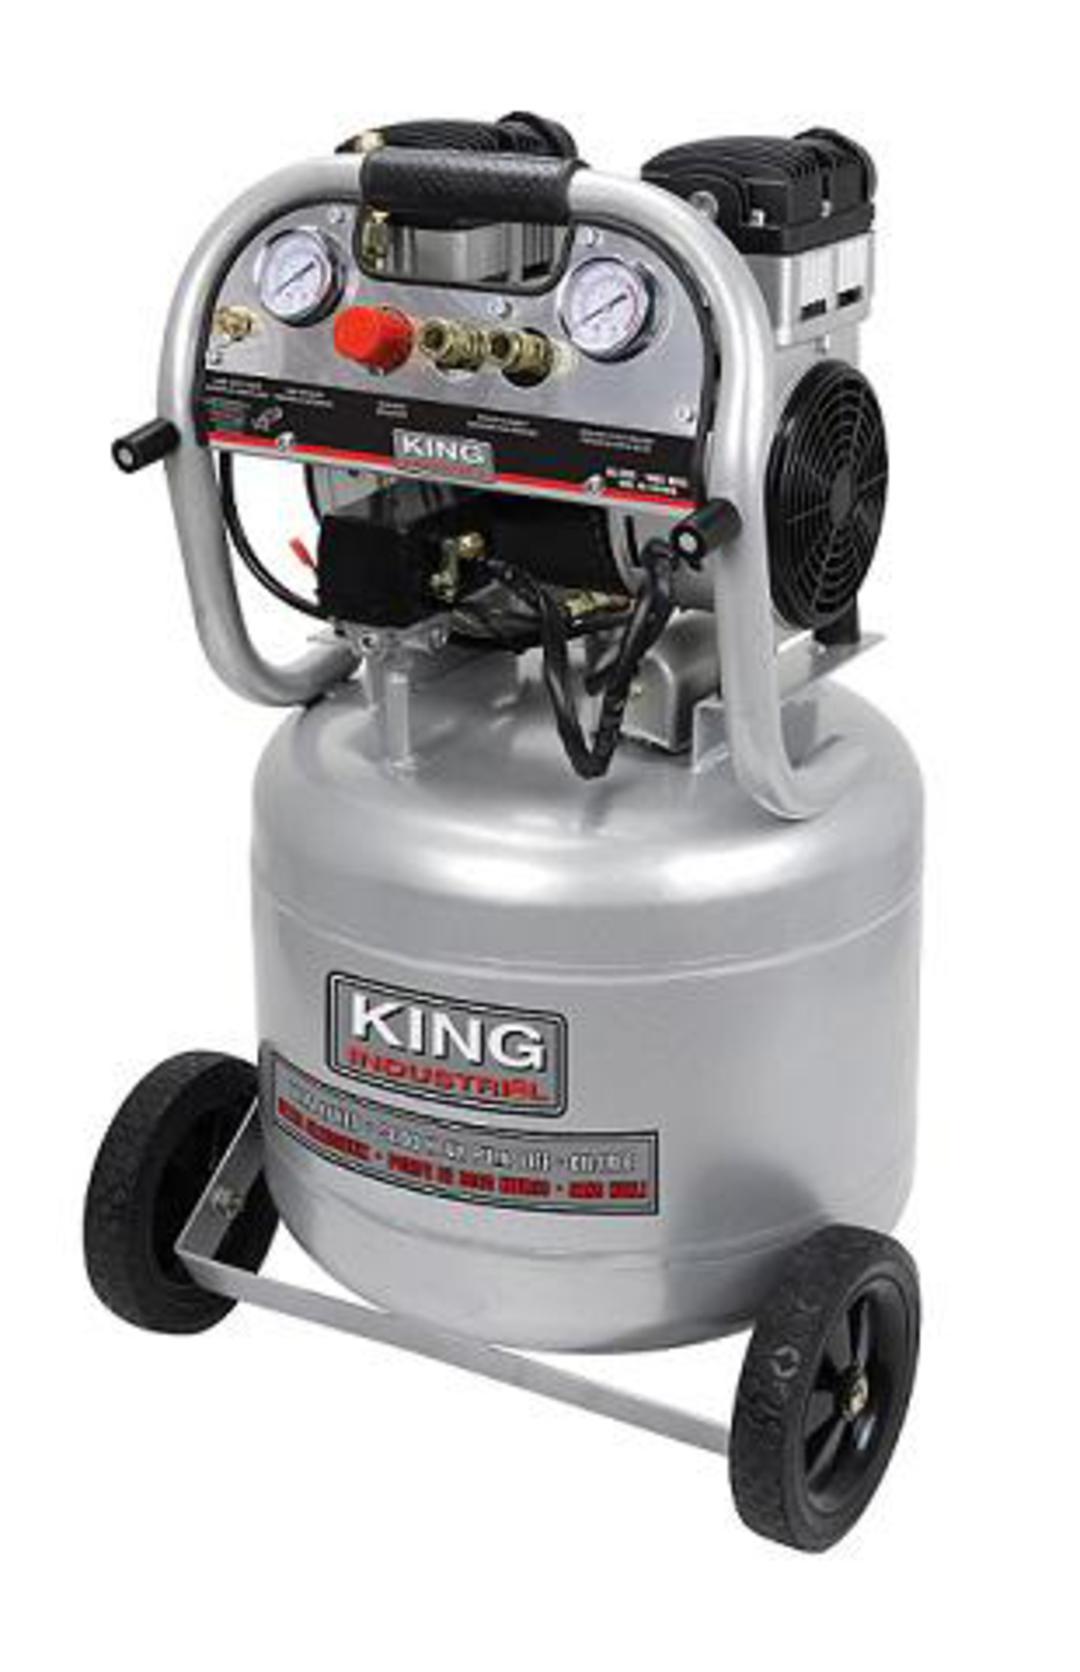 Oil Free Air Compressor >> King 10 Gallon Ultra Quiet Oil Free Air Compressor Kc 10020sq